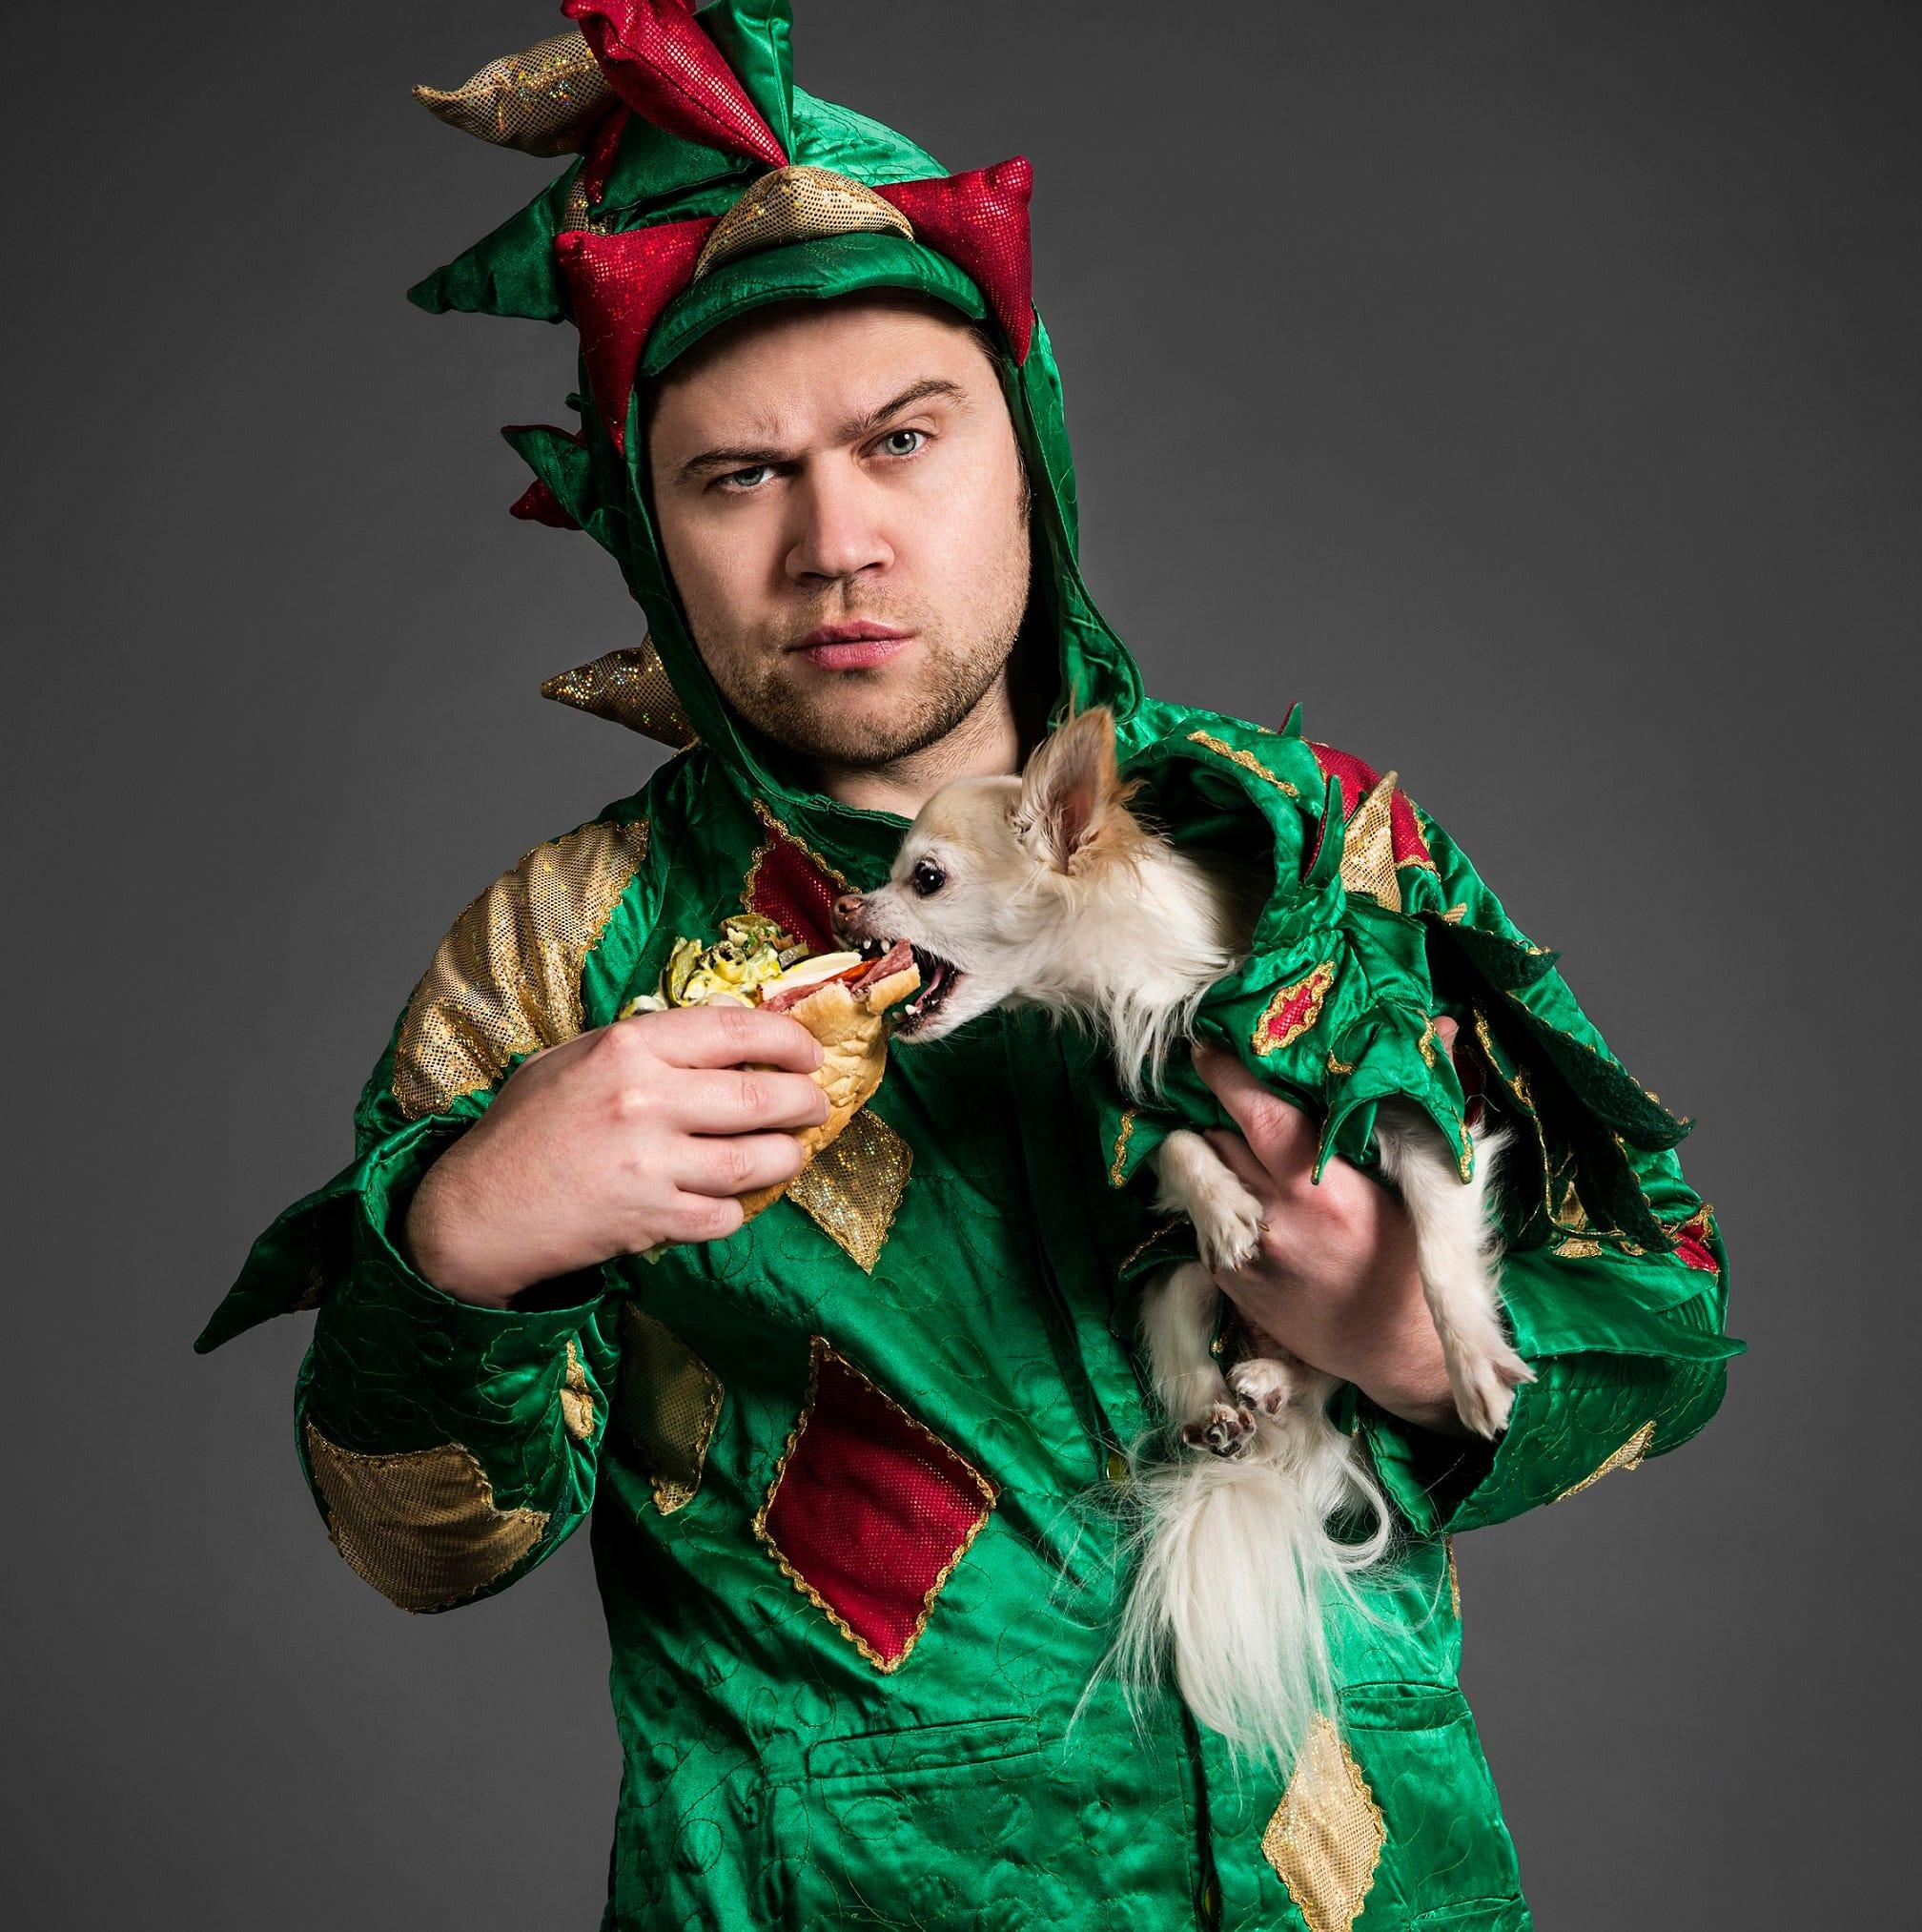 Half magic, half comedy, all dragon: Piff the Magic Dragon coming to Sioux Falls